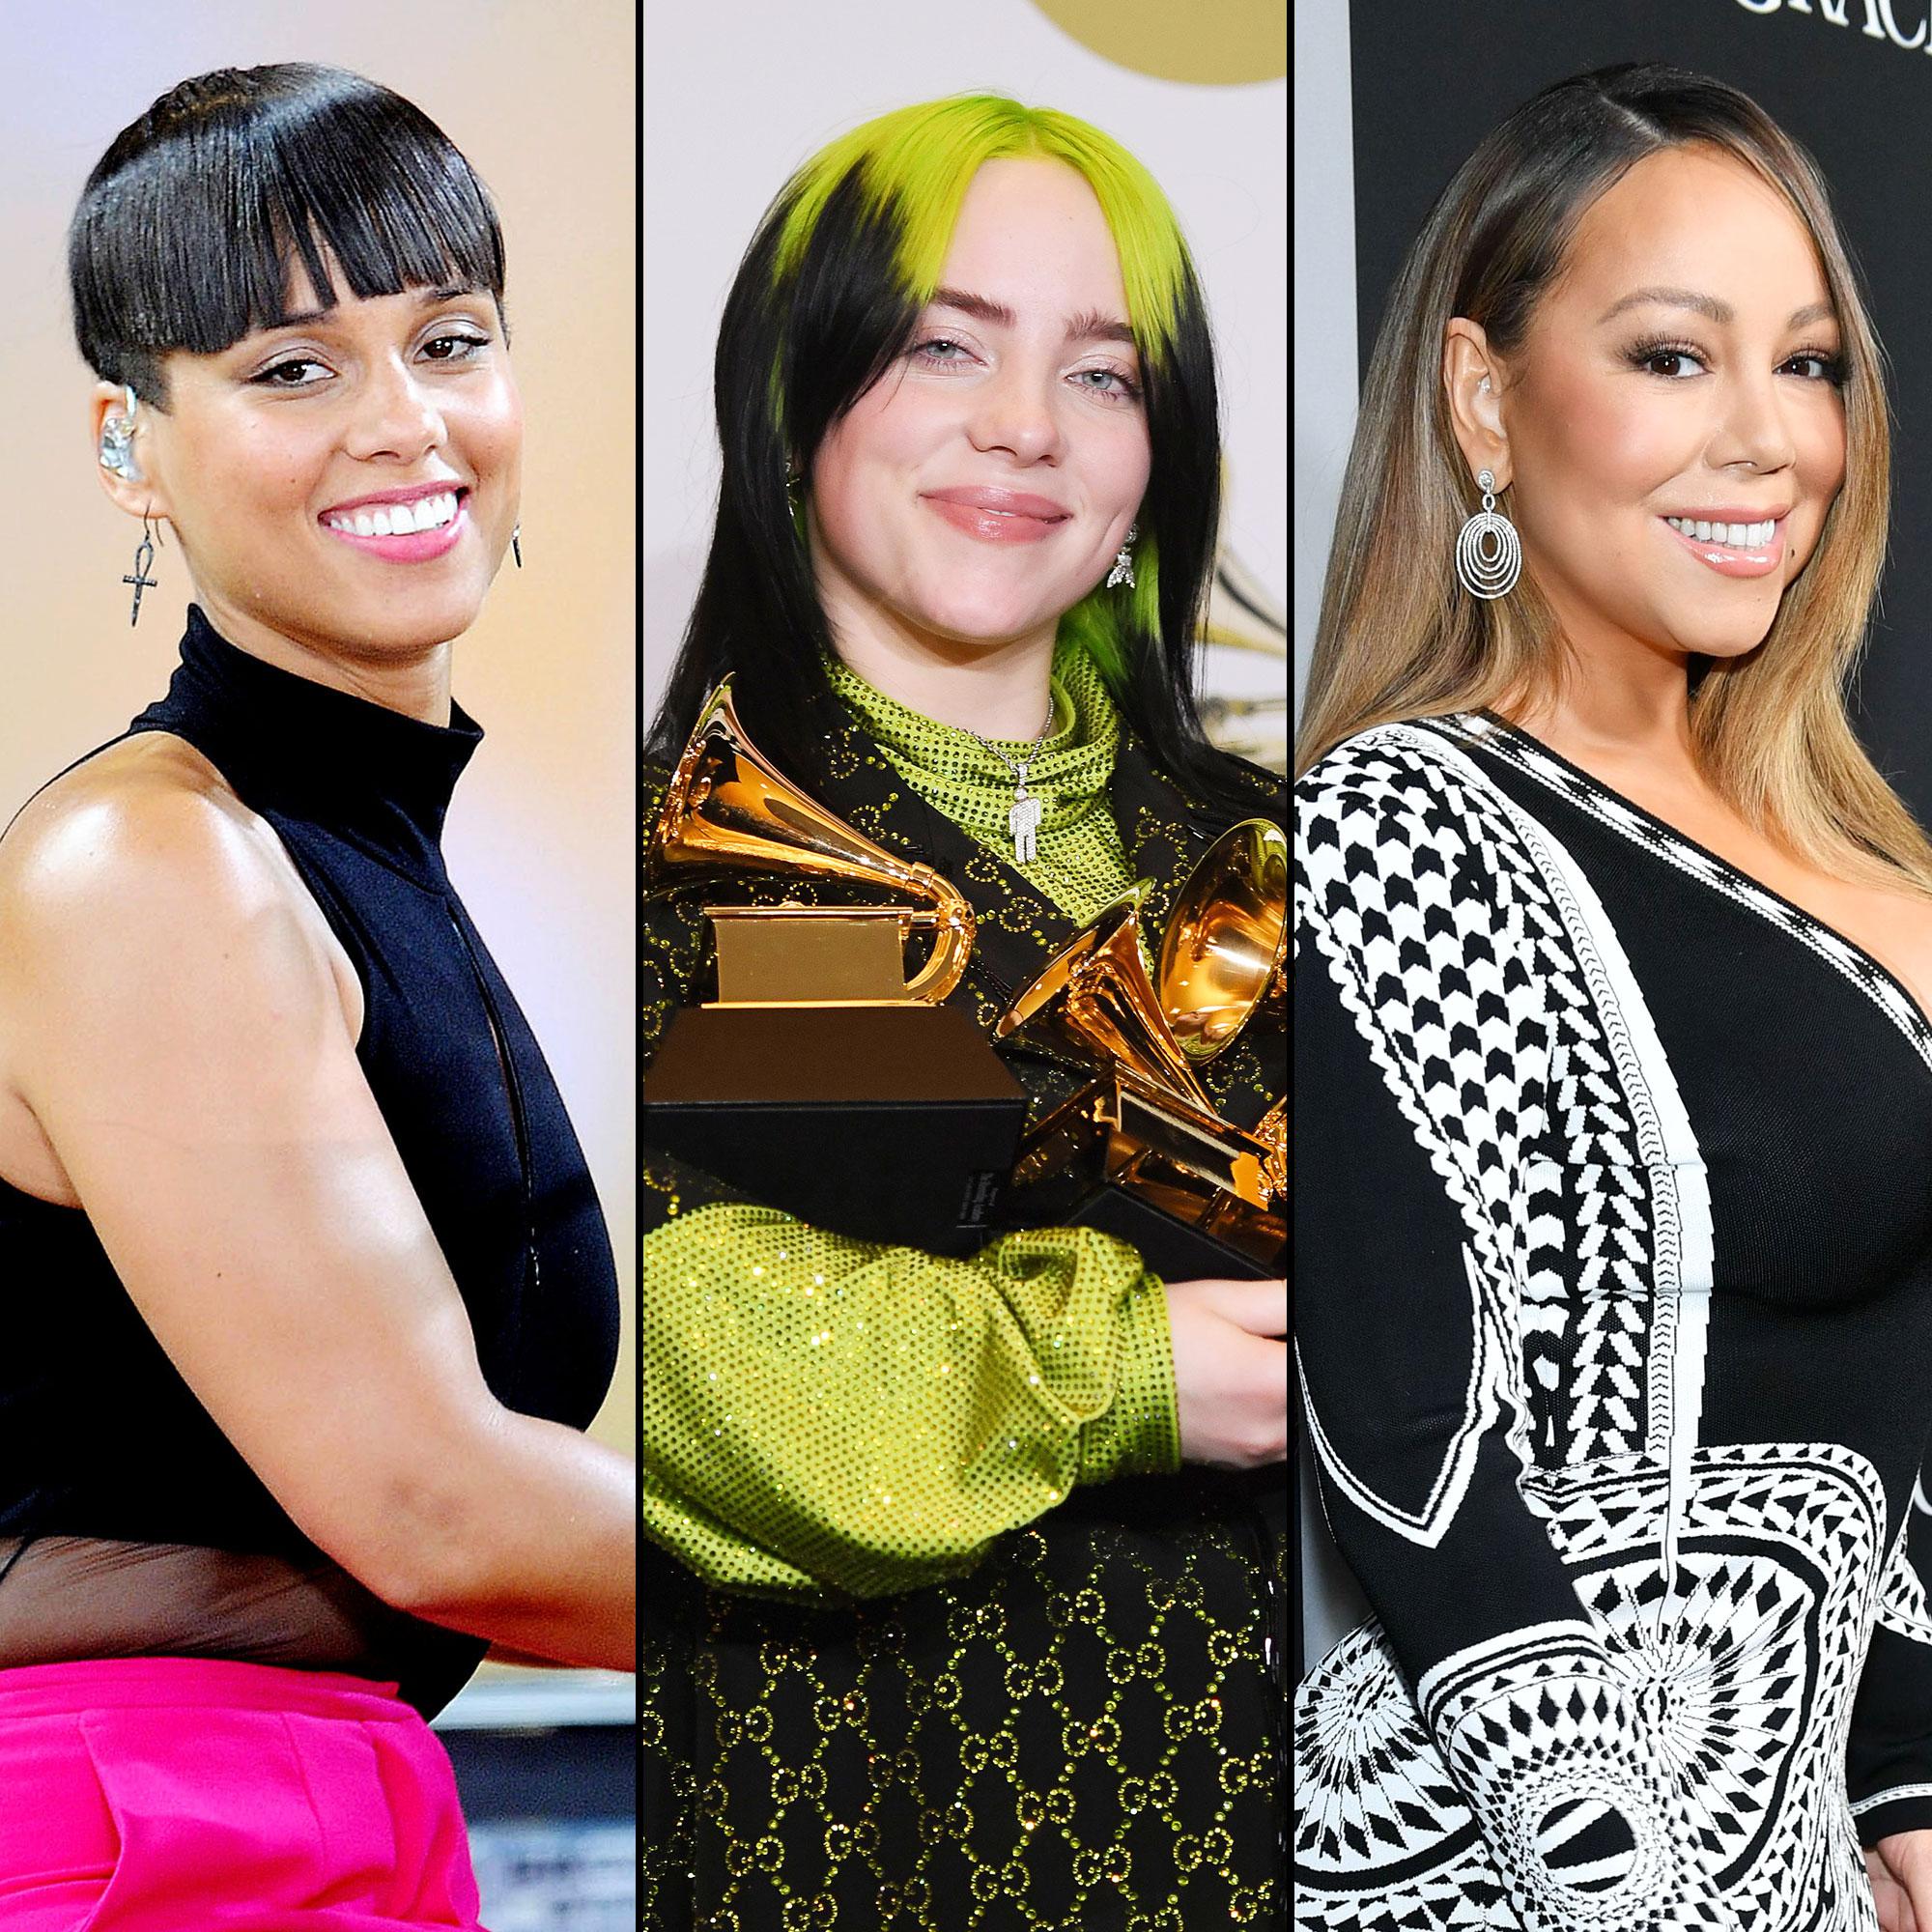 Elton John to Host Star-Studded Coronavirus Benefit Concert with Alicia Keys Billie Eilish and Mariah Carey